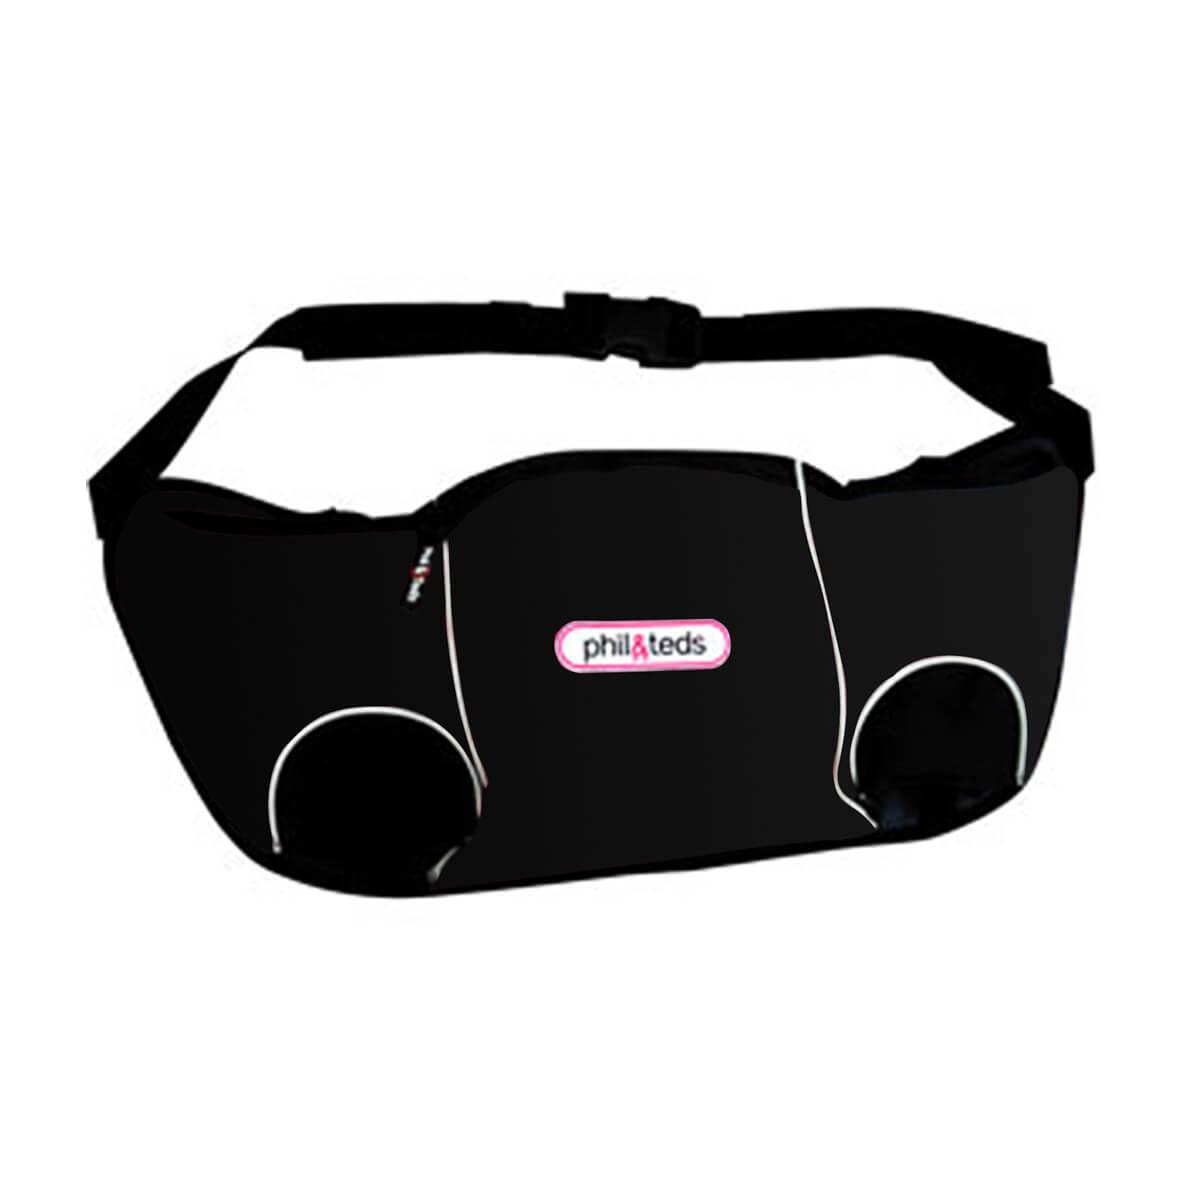 phil&teds hangbag stroller handle フィルアンドテッズ ハンドバッグ 3カラーあり!